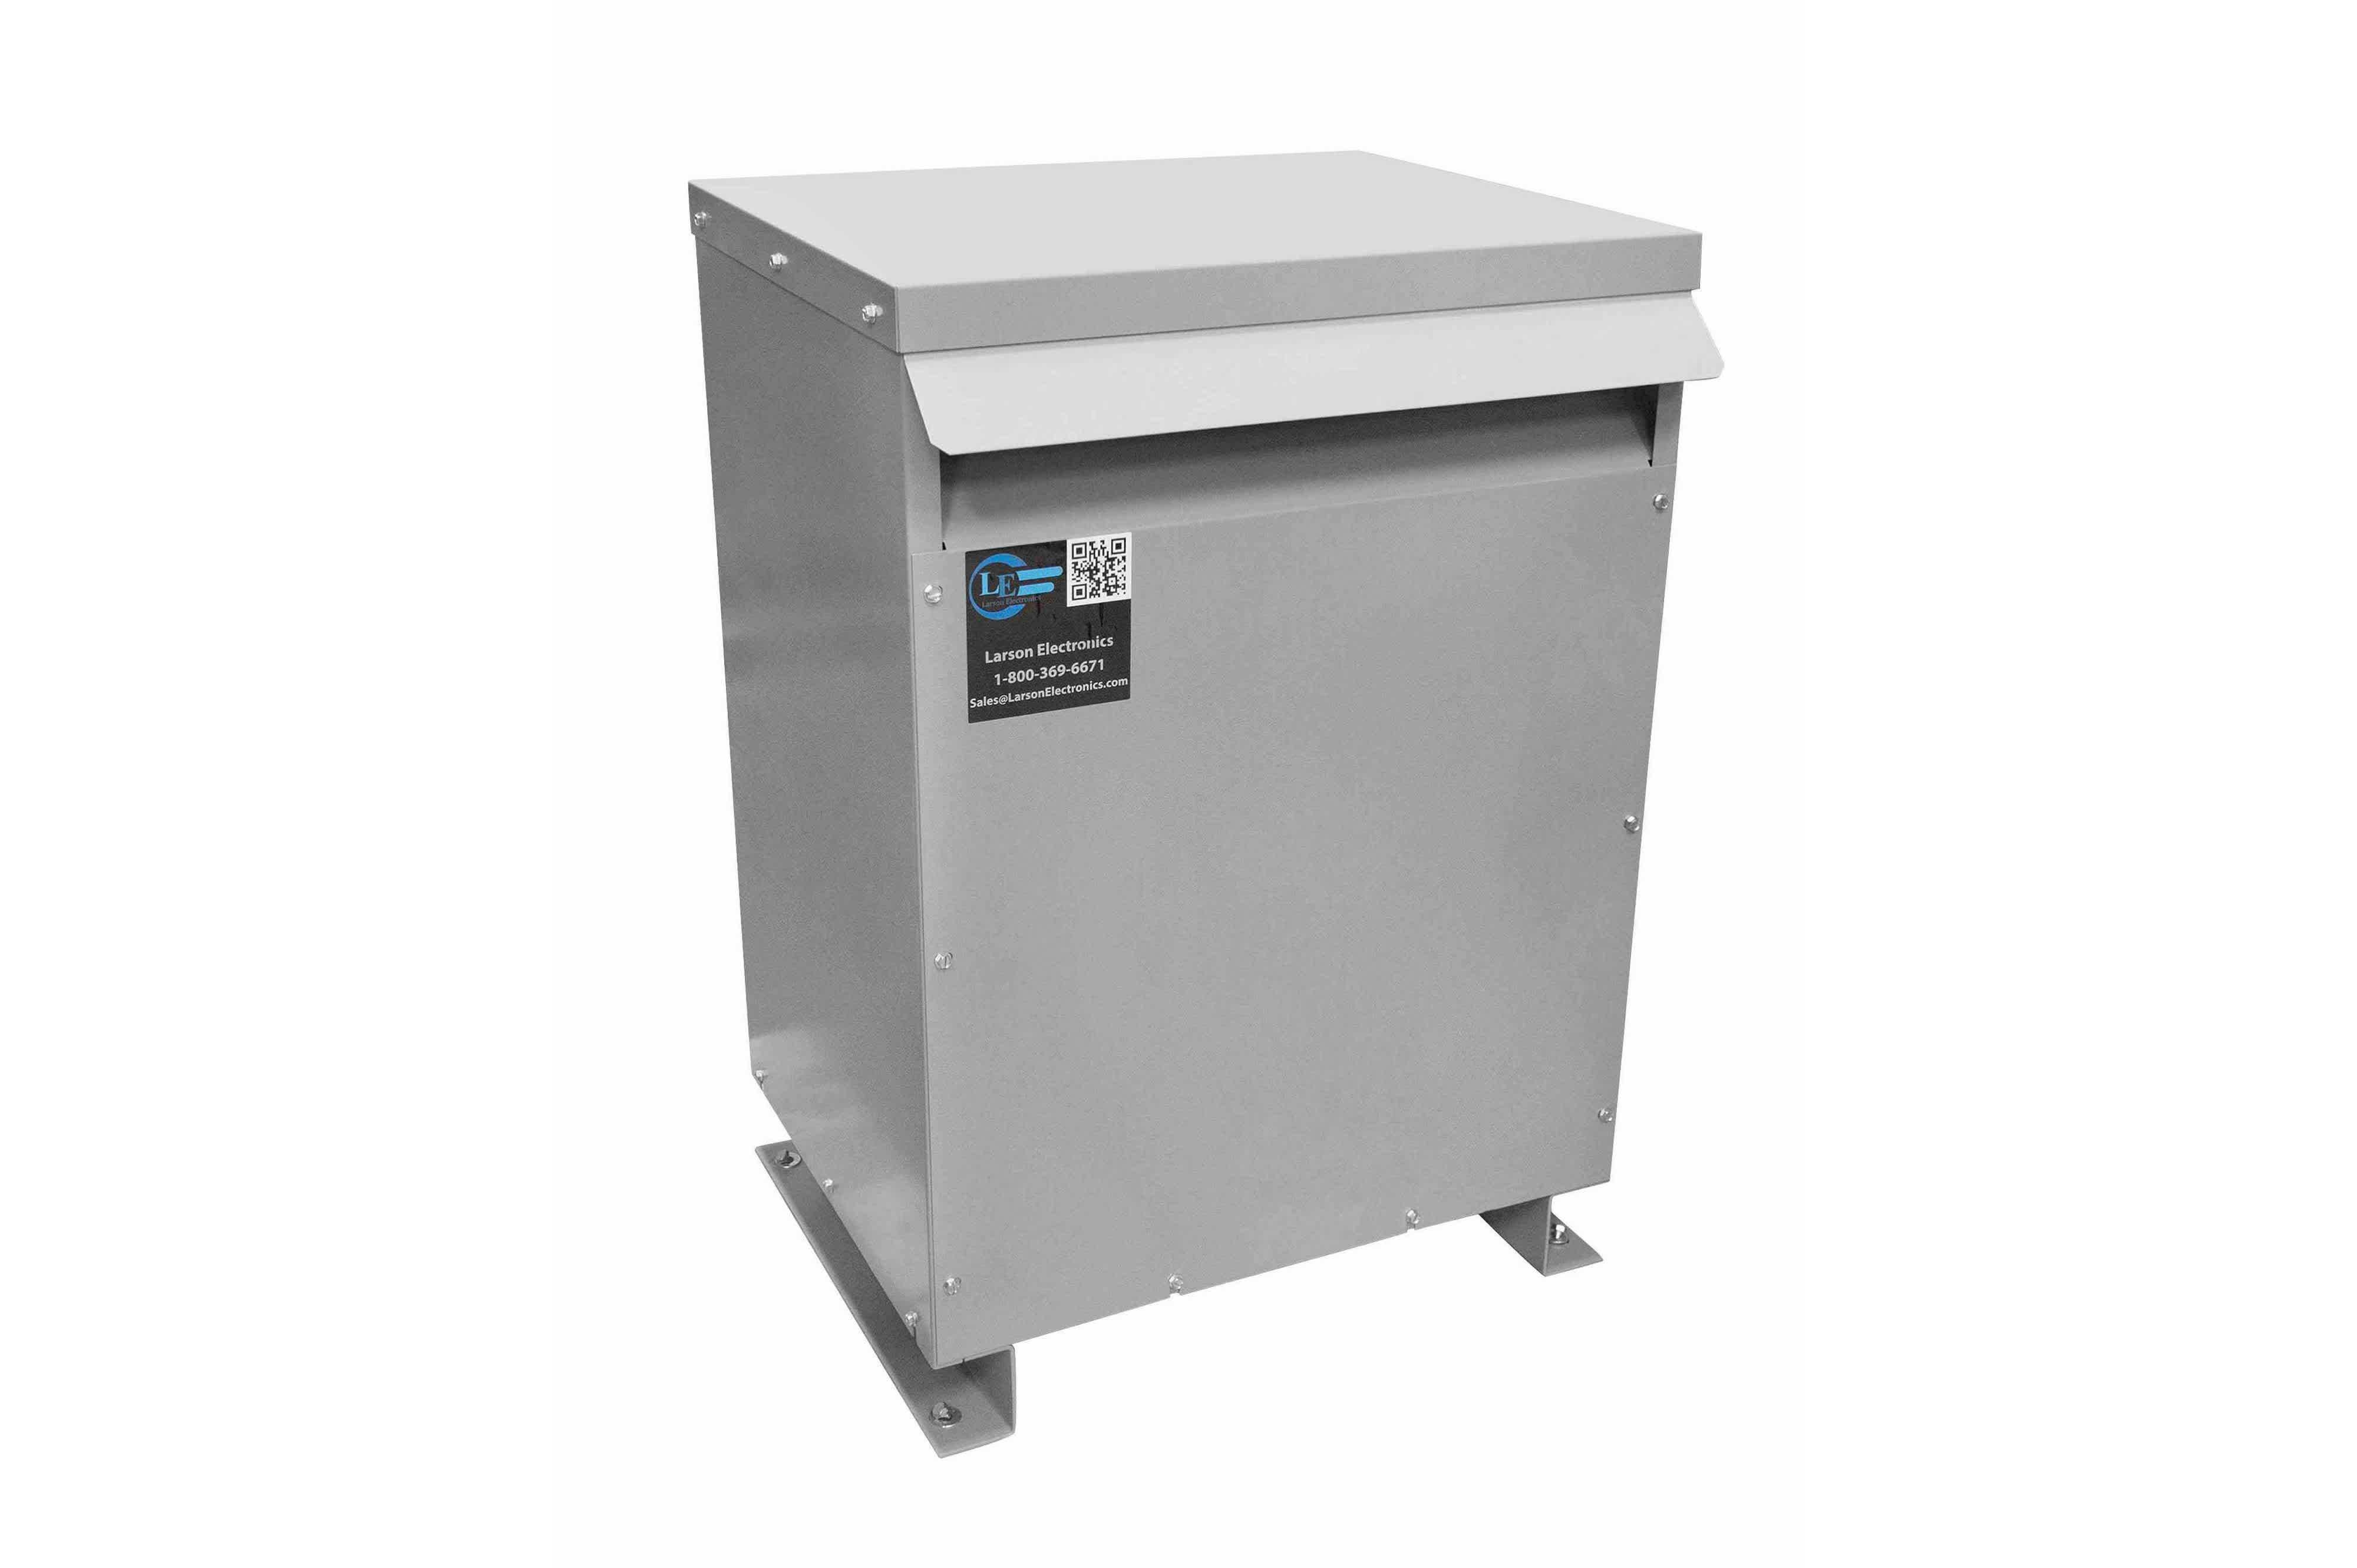 125 kVA 3PH Isolation Transformer, 600V Wye Primary, 240V Delta Secondary, N3R, Ventilated, 60 Hz